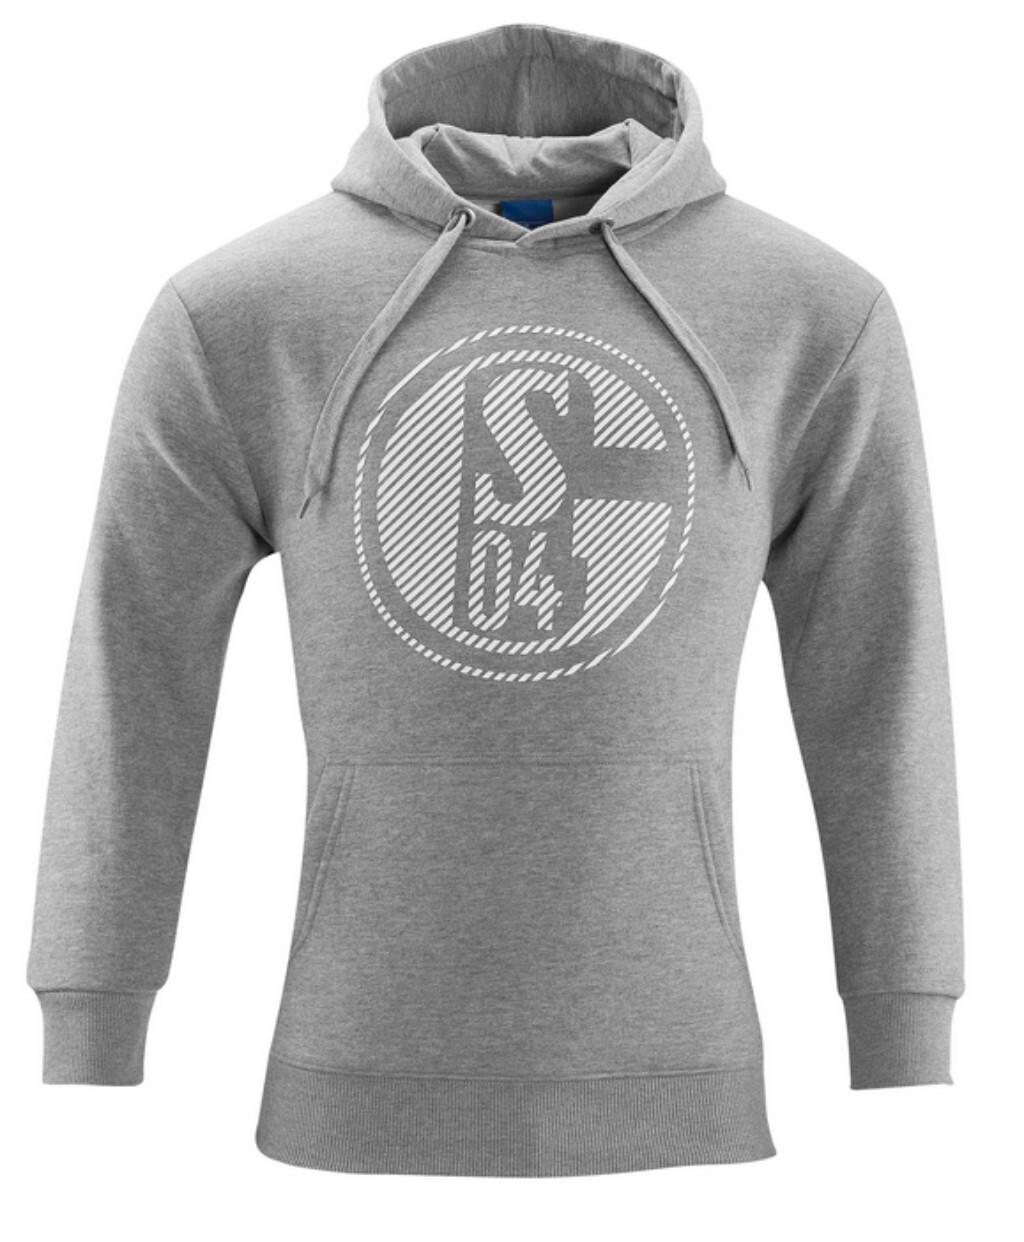 FC Schalke 04 Kinder Sweat-Shirt Classic Navy